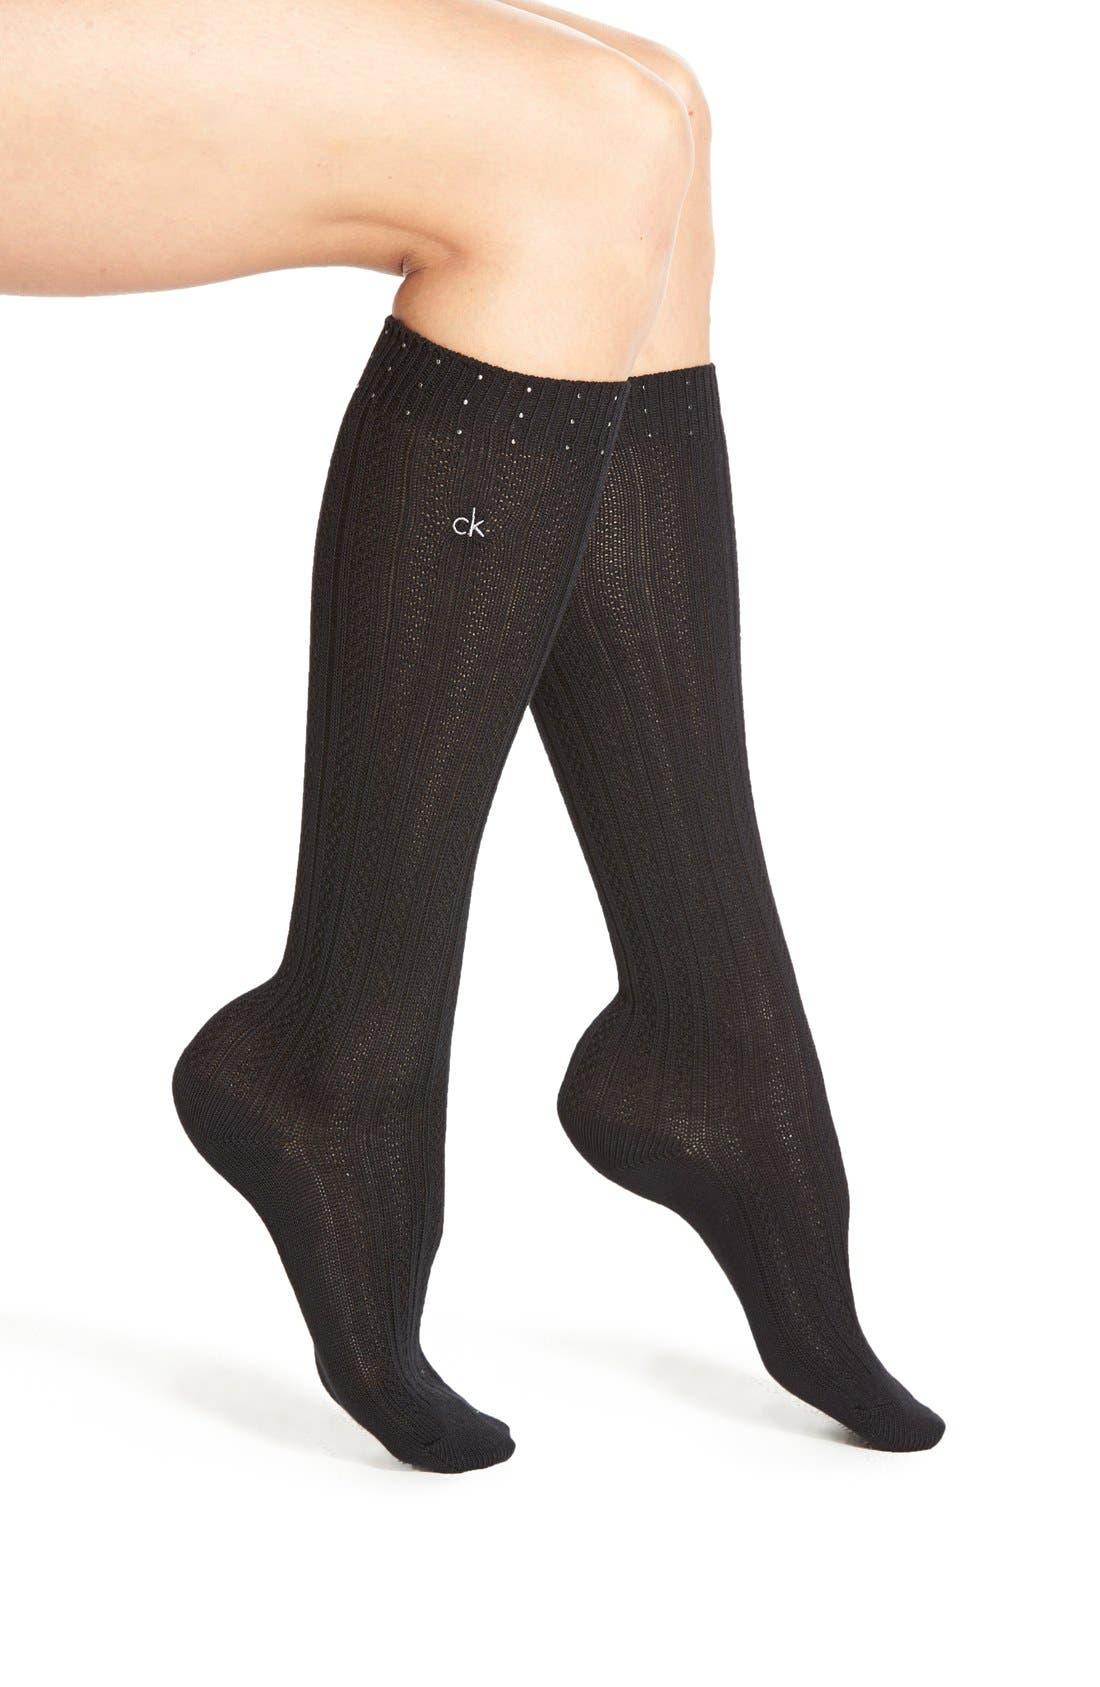 Main Image - Calvin Klein 'Holiday Sparkle' Knee High Socks